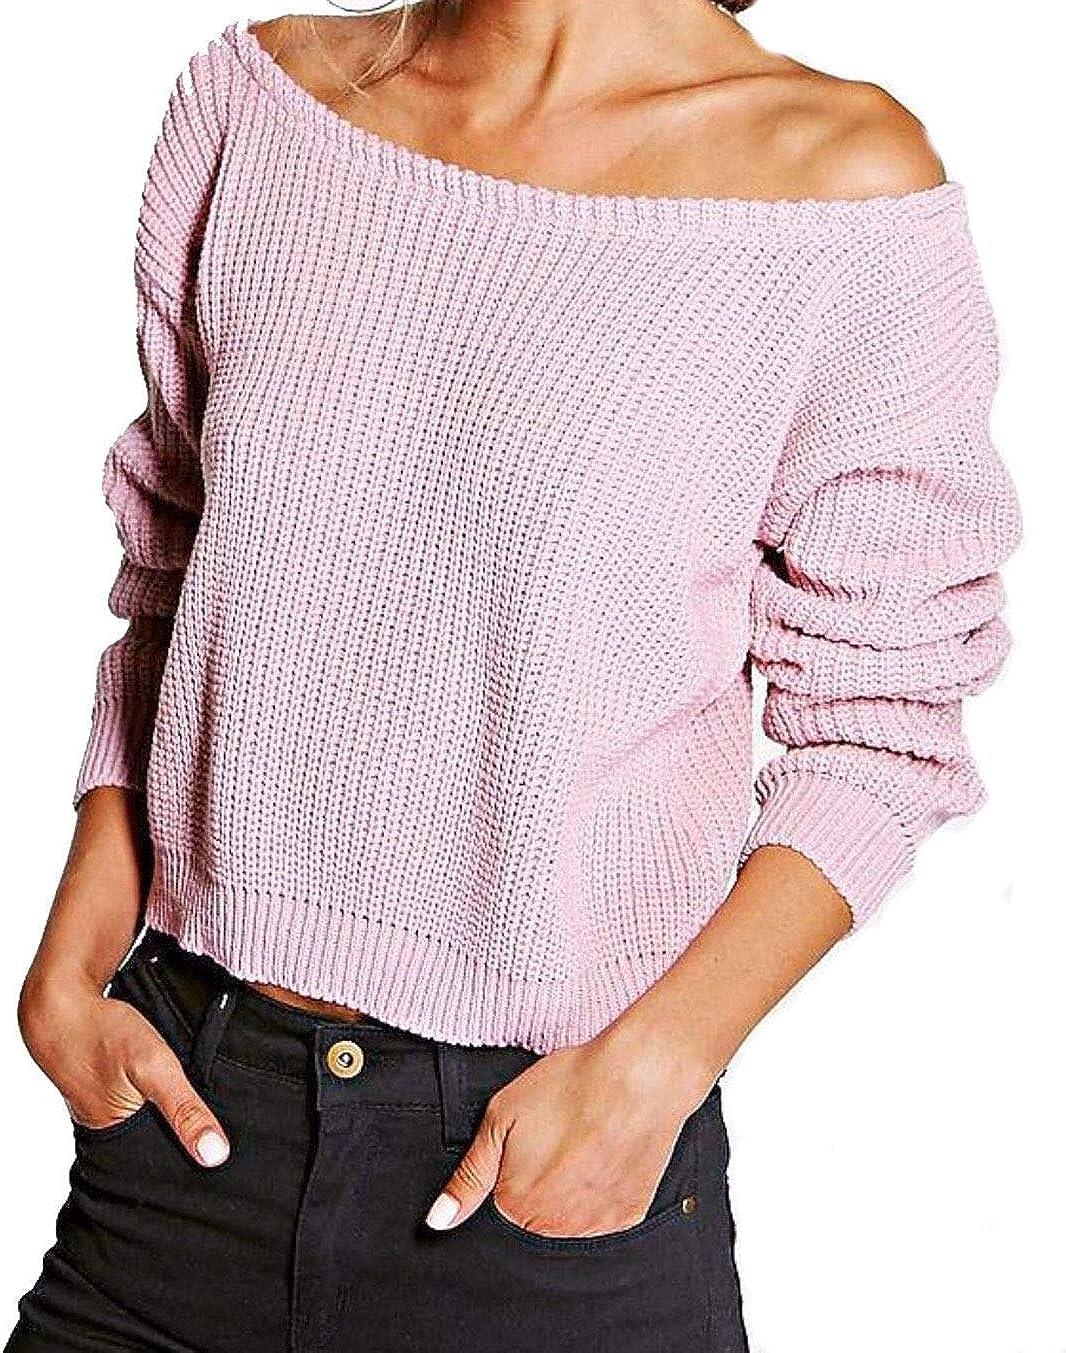 REAL LIFE FASHION LTD Ladies Slash Neck Off Shoulder Cropped Jumper Womens Knitted Long Sleeve Top